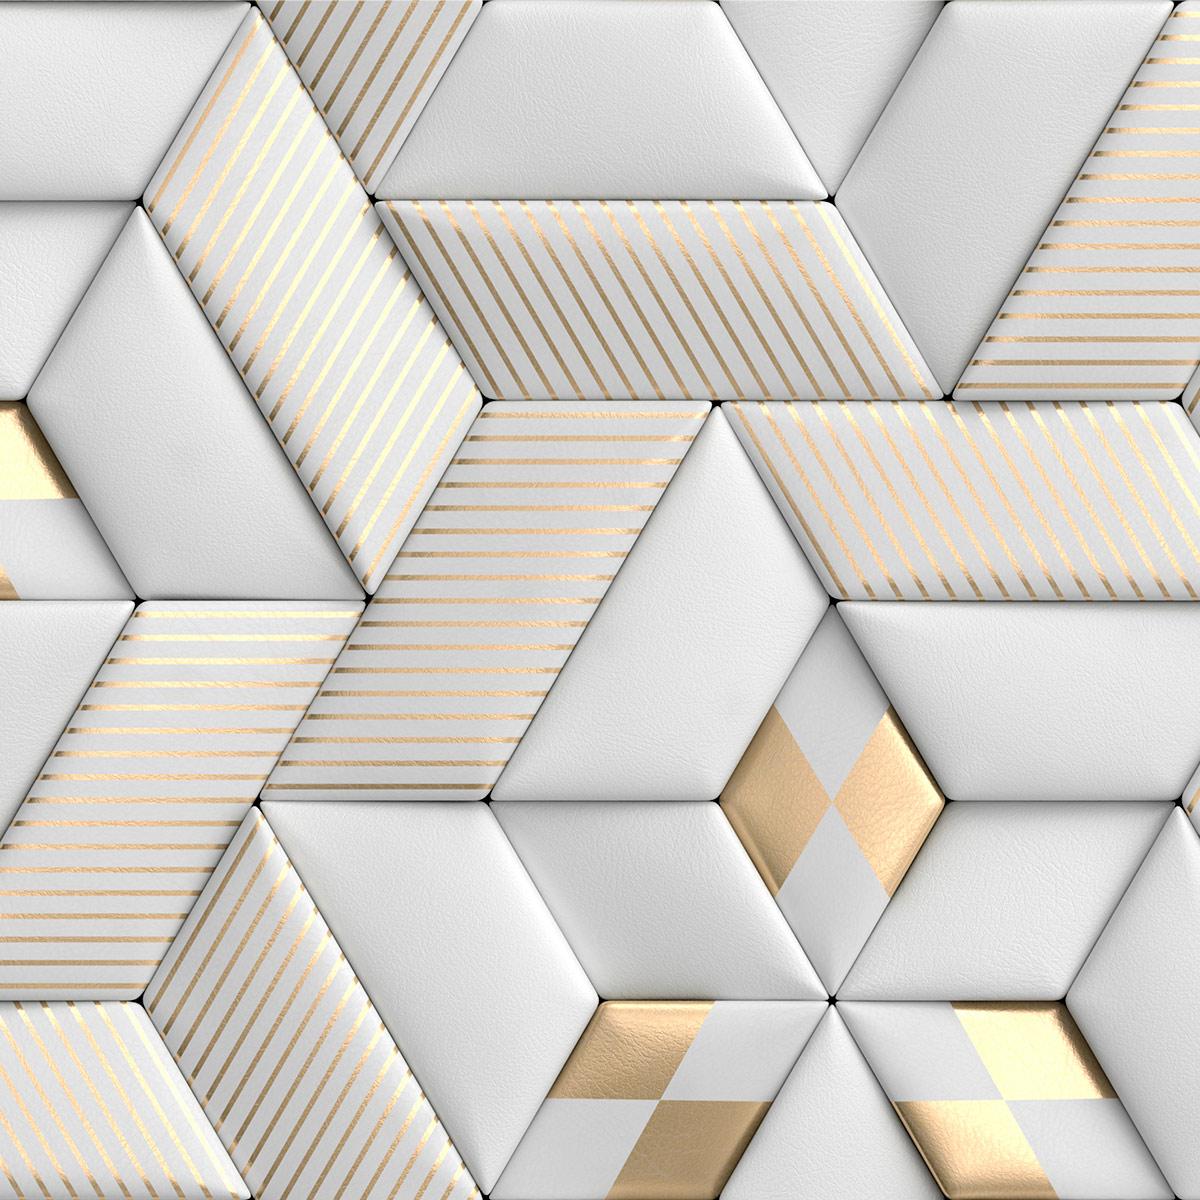 Papel de Parede 3D Geométrico Efeito Couro Gold Adesivo